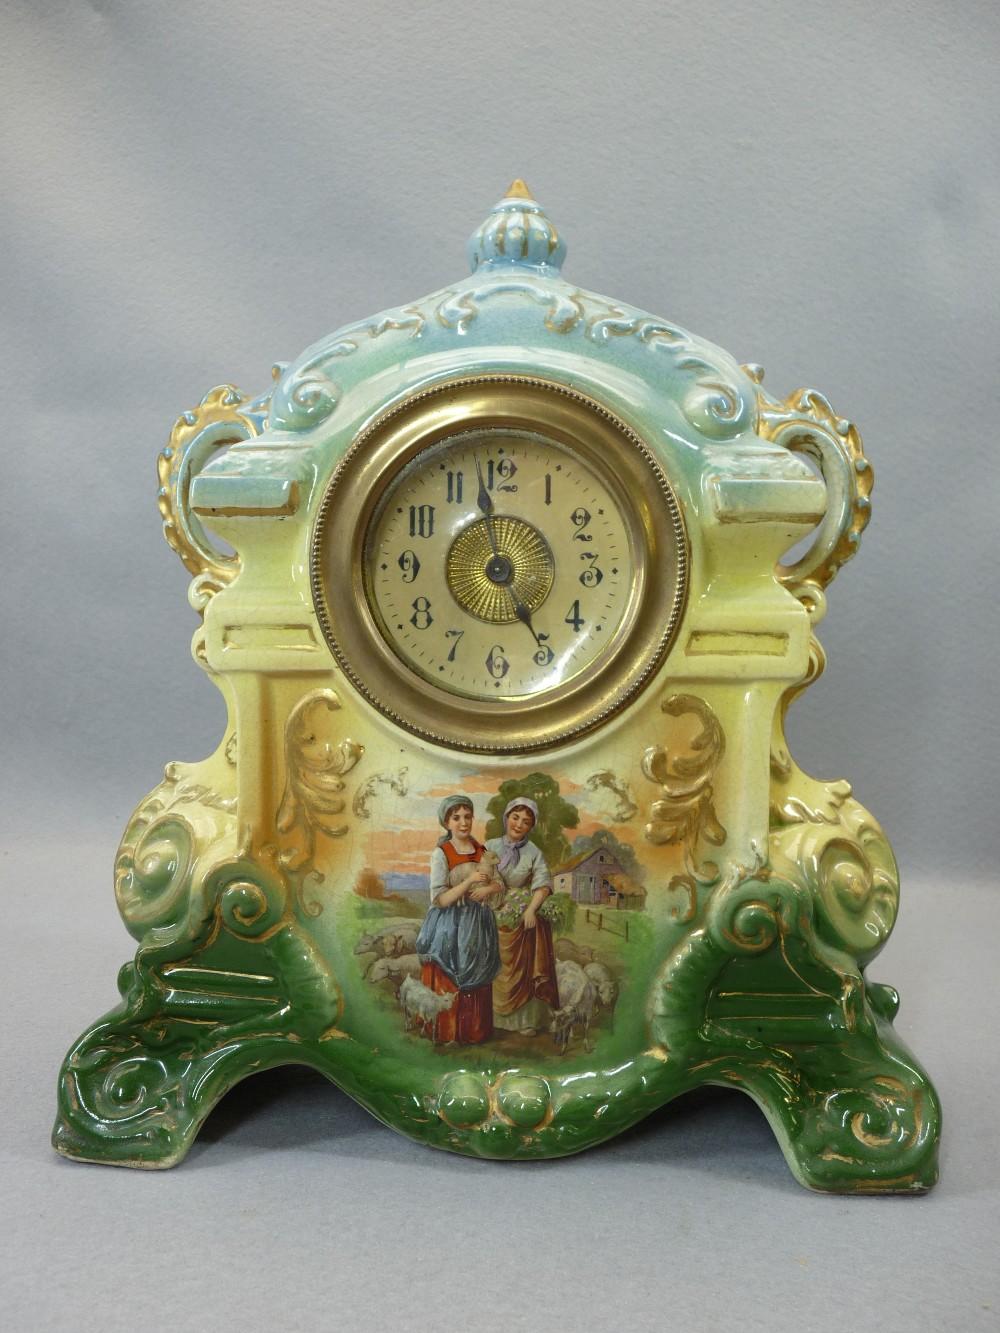 TURNED WALNUT DRUM CASED QUARTZ MANTEL CLOCK and a Victorian cheapware pottery mantel clock, 29 - Image 2 of 3